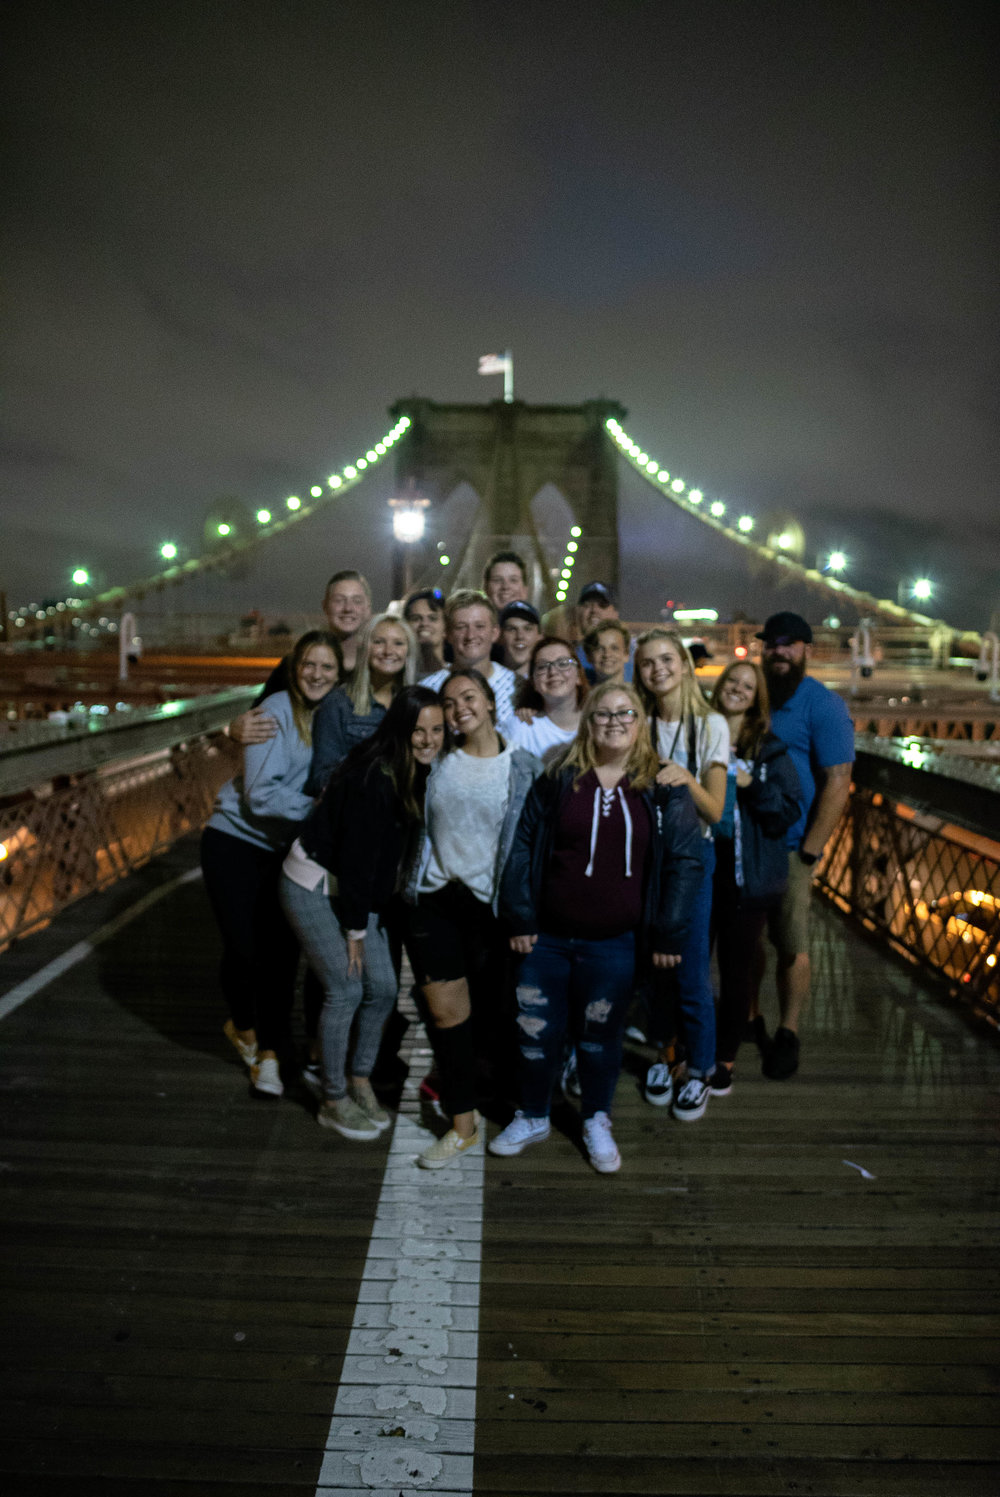 CITY (BROOKLYN BRIDGE) GROUP.jpg